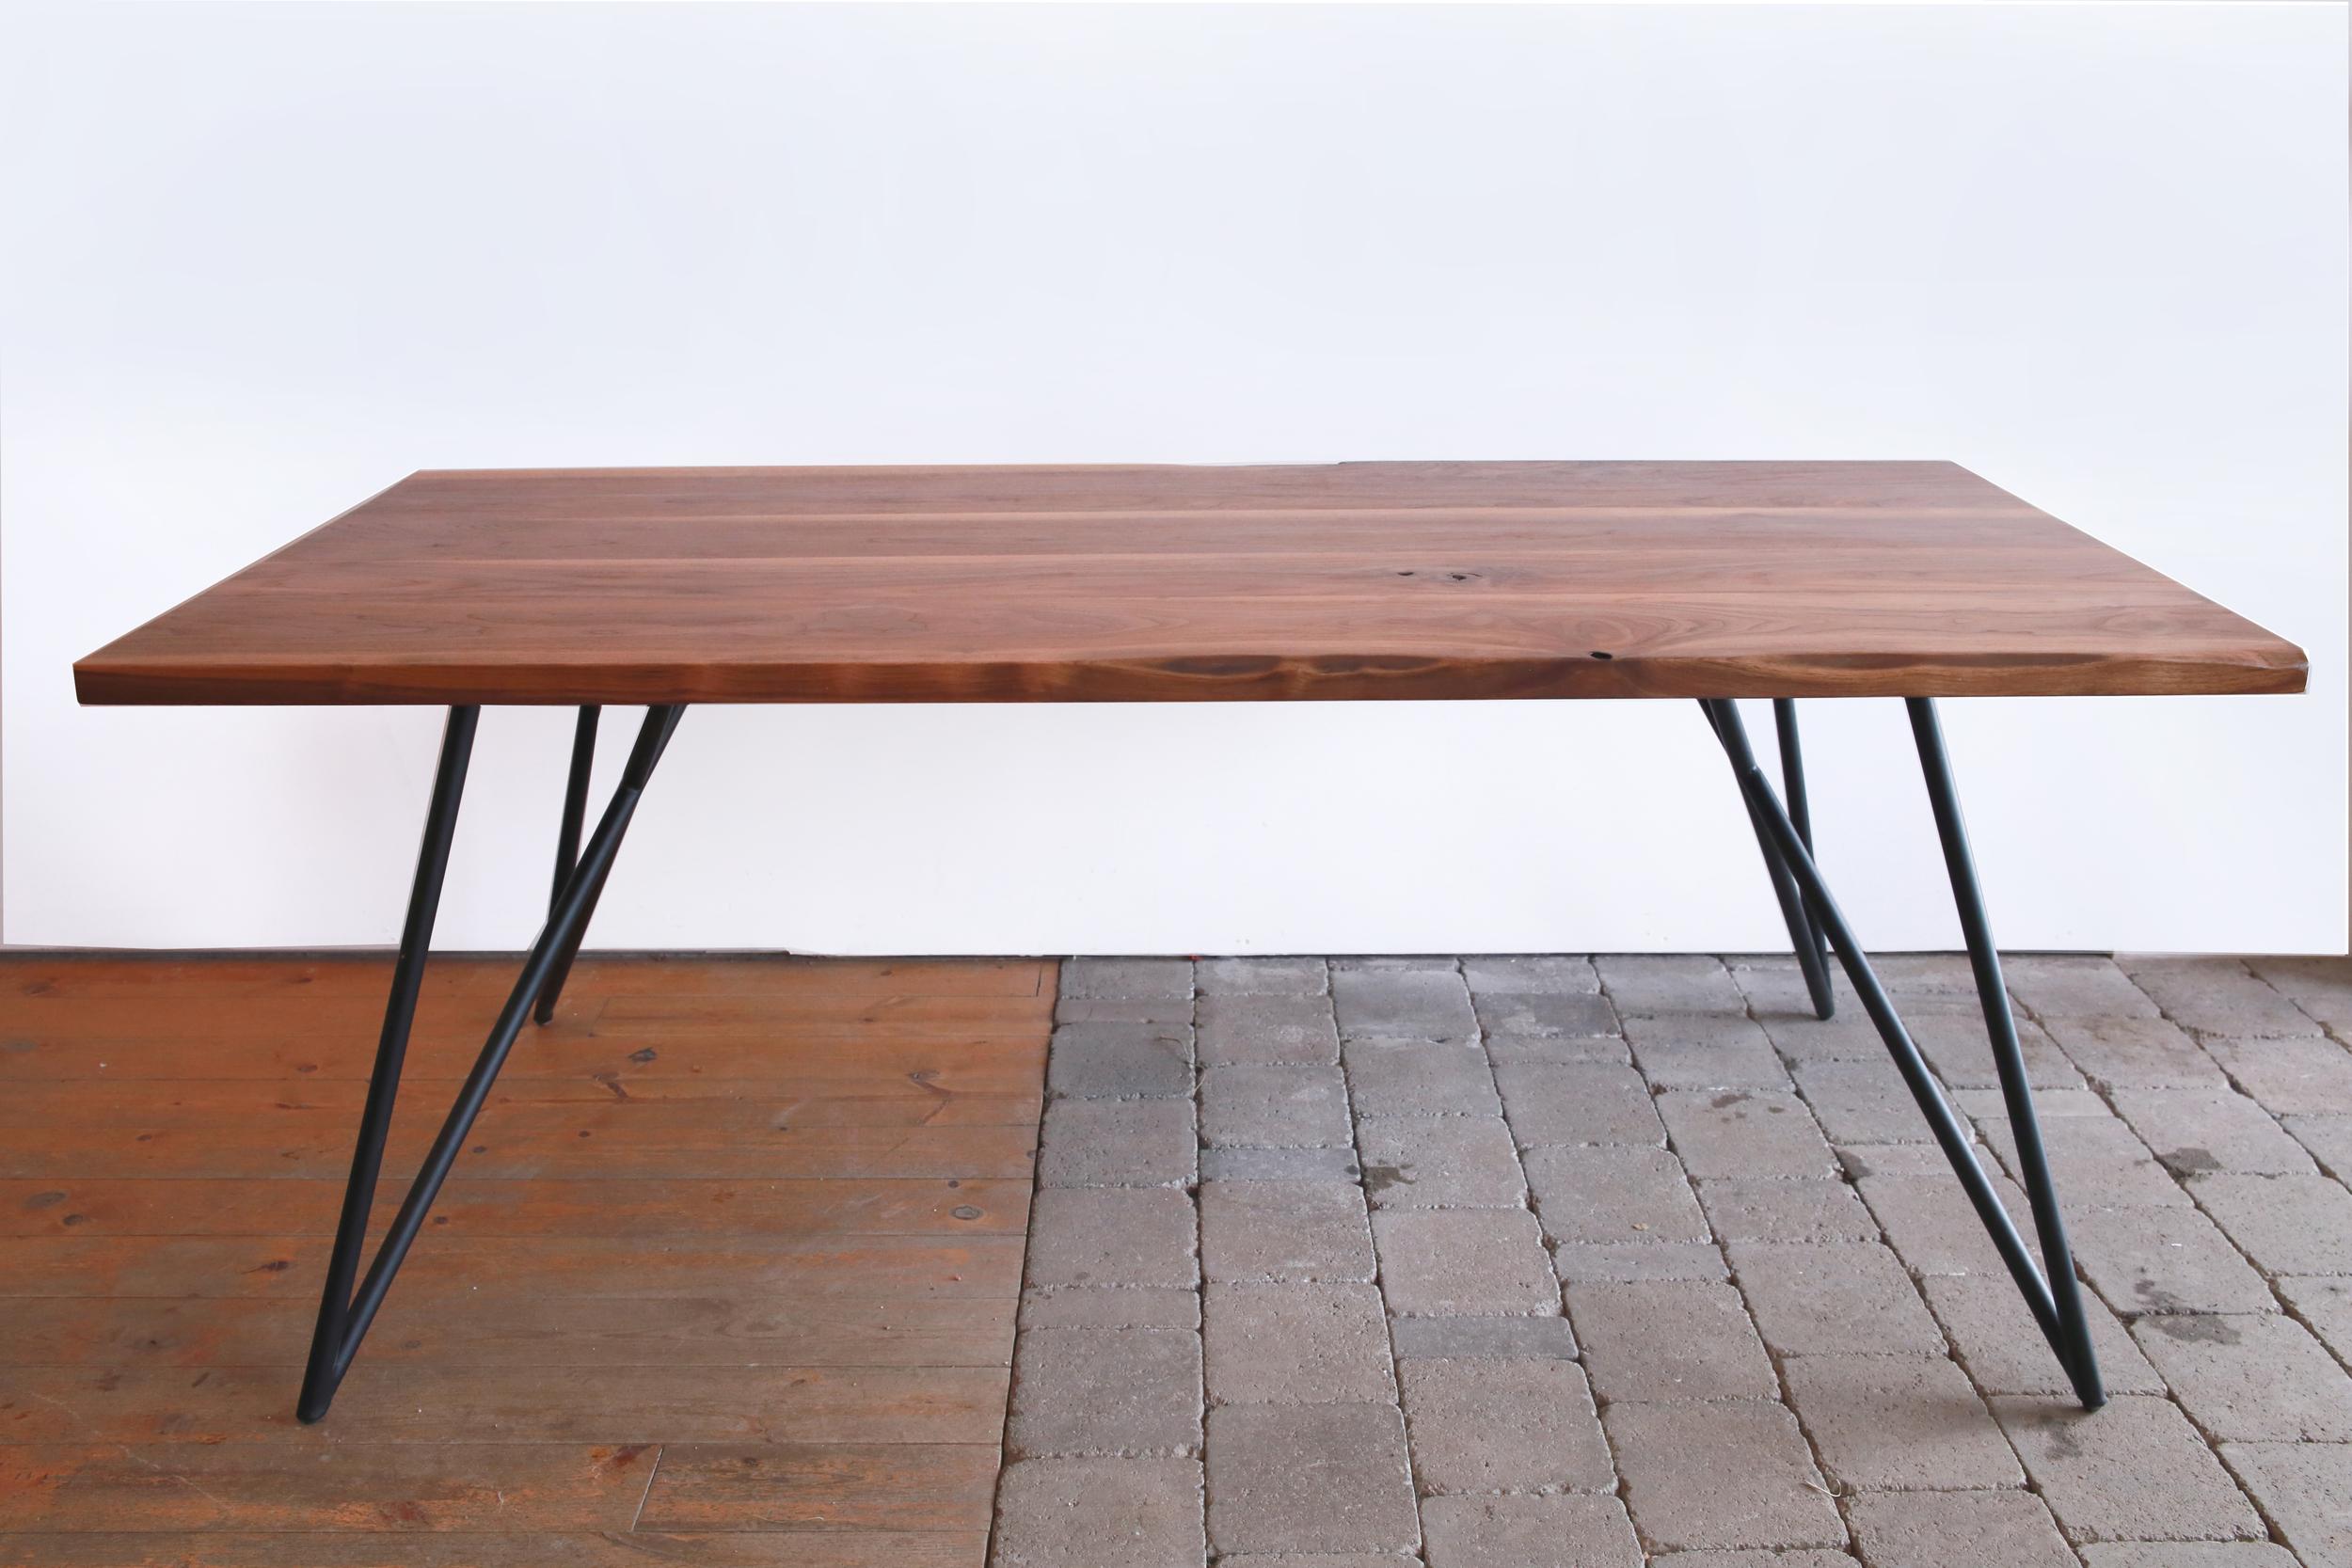 SLAB_table-3.jpg